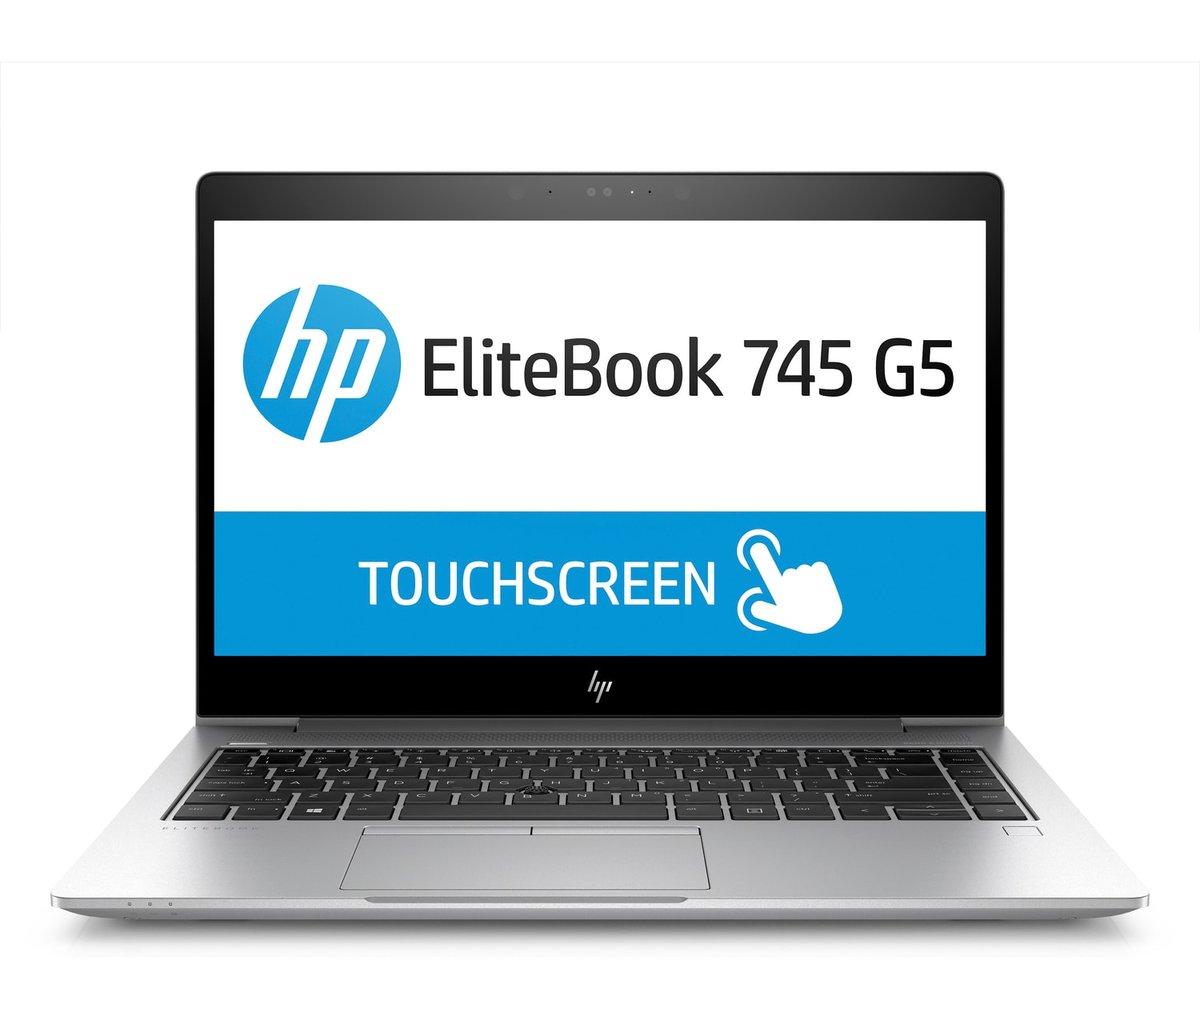 Hp Elitebook 745 G5 Ryzen 5 2500u 8gb 256gb Radeon Vega 14 Inch